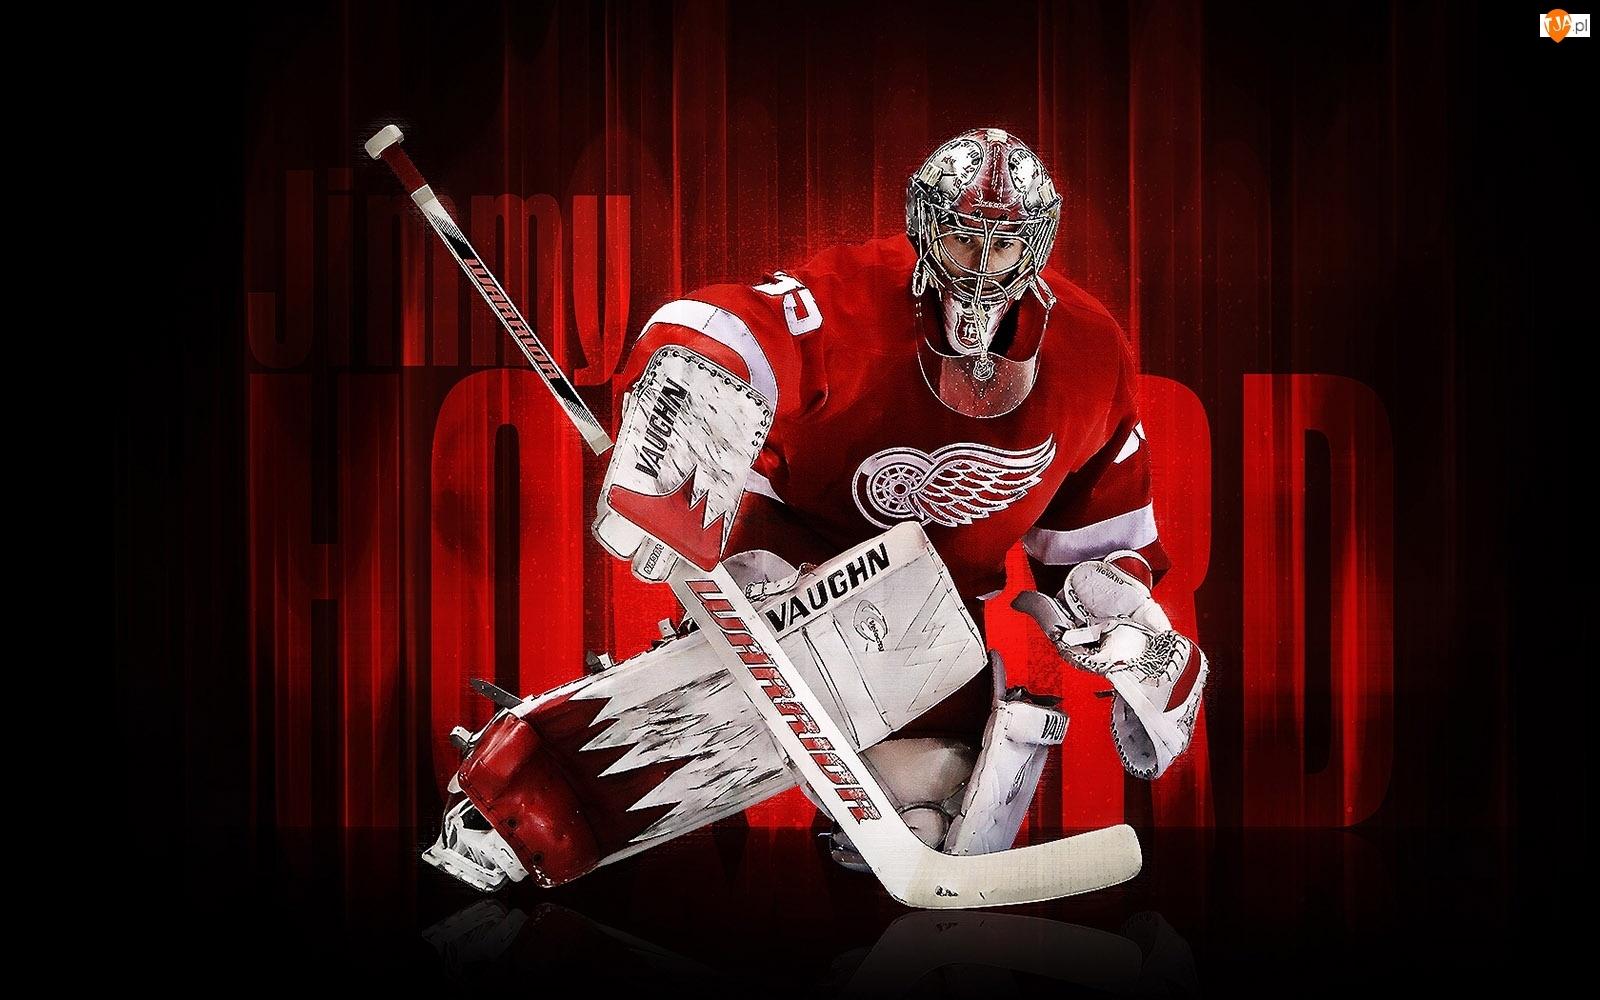 Hokej, NHL, Bramkarz, Detroit Red Wings